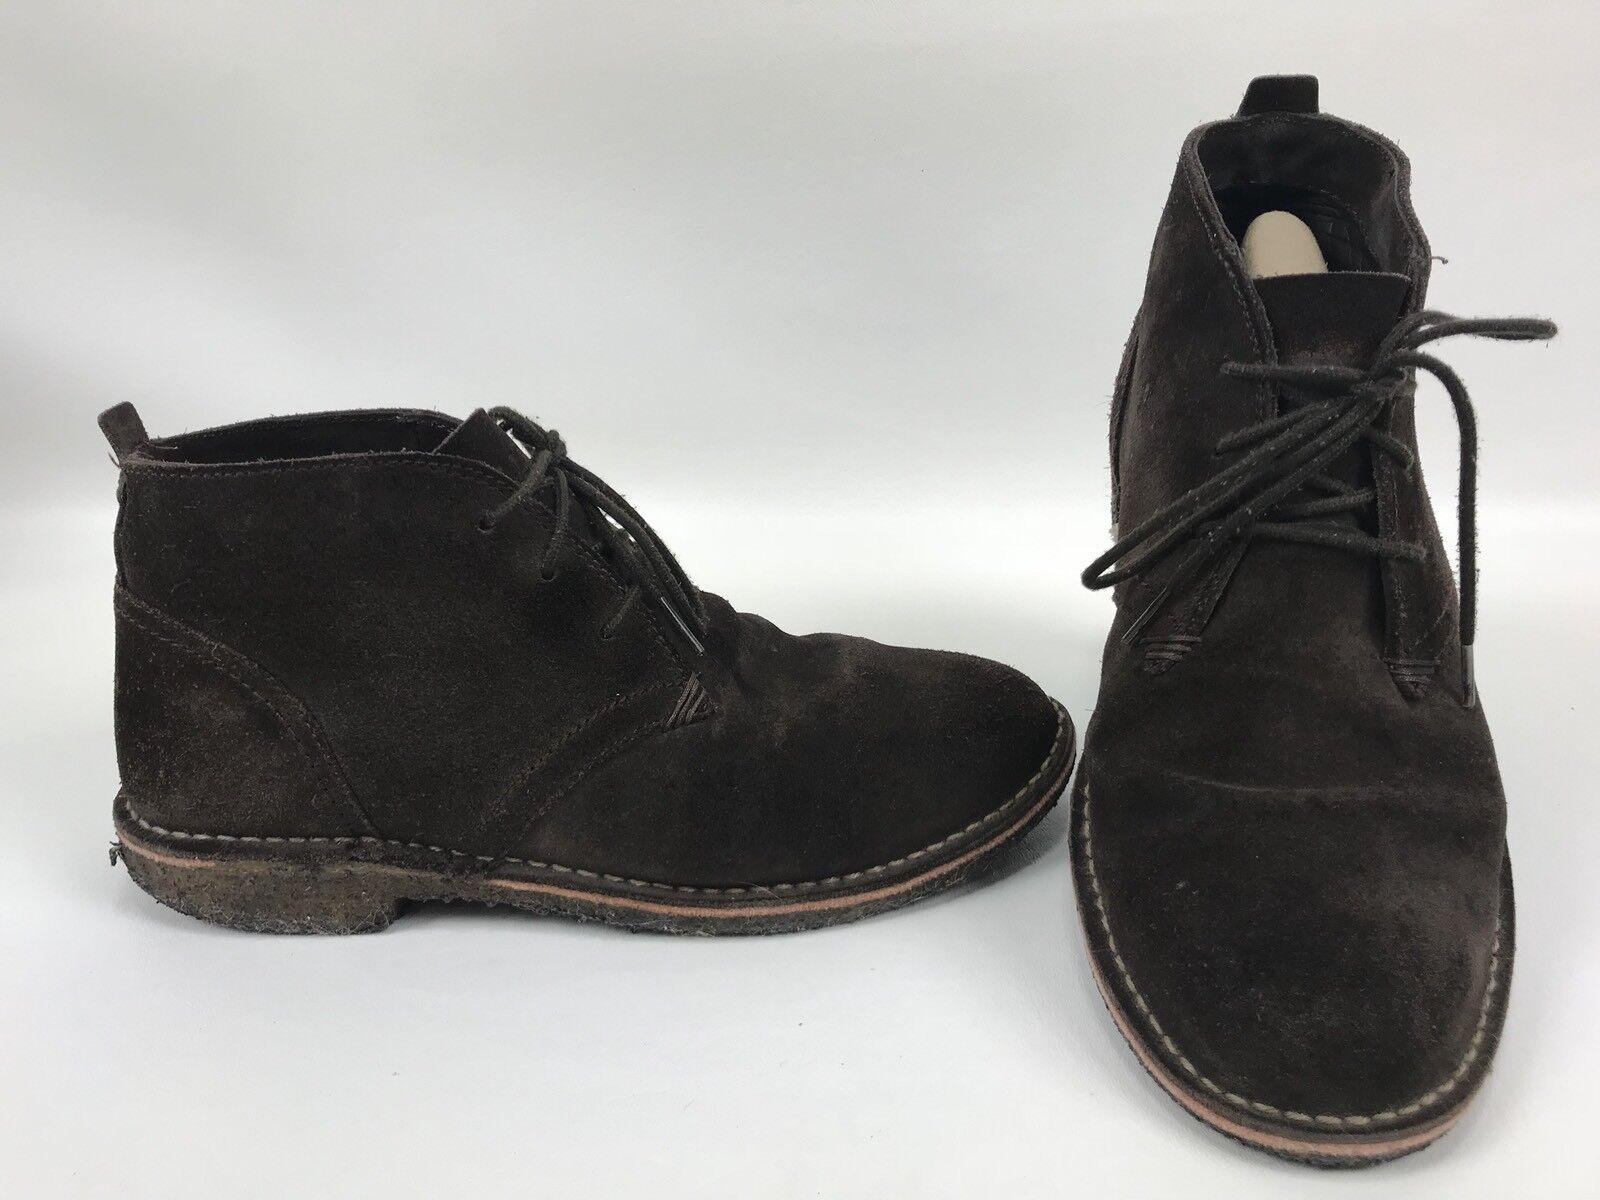 LL BEAN Suede Desert Ankle Chukka Boots Men's Size 10 M Crepe Soles Dark Brown